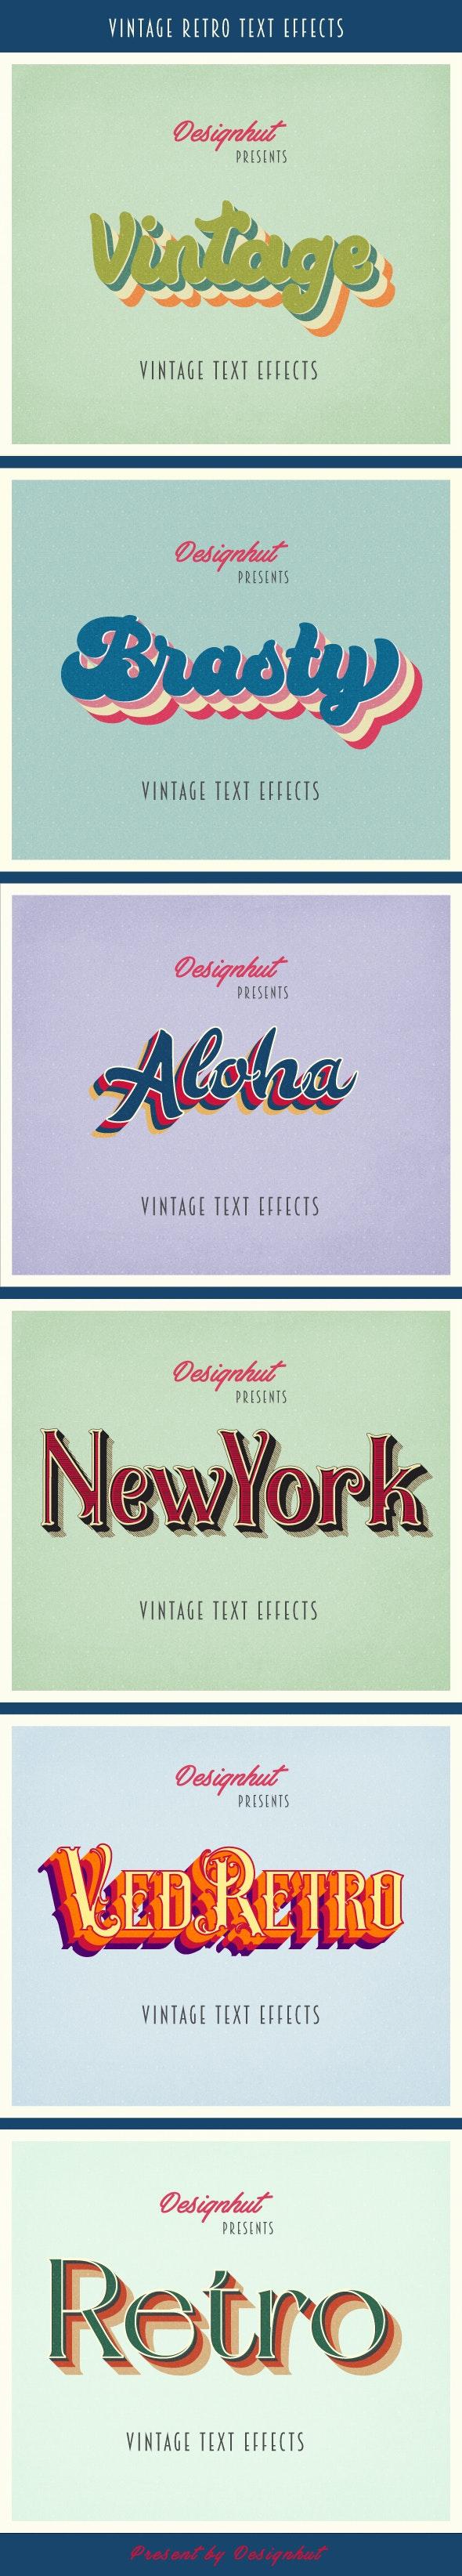 Vintage Retro Text effects - Styles Illustrator